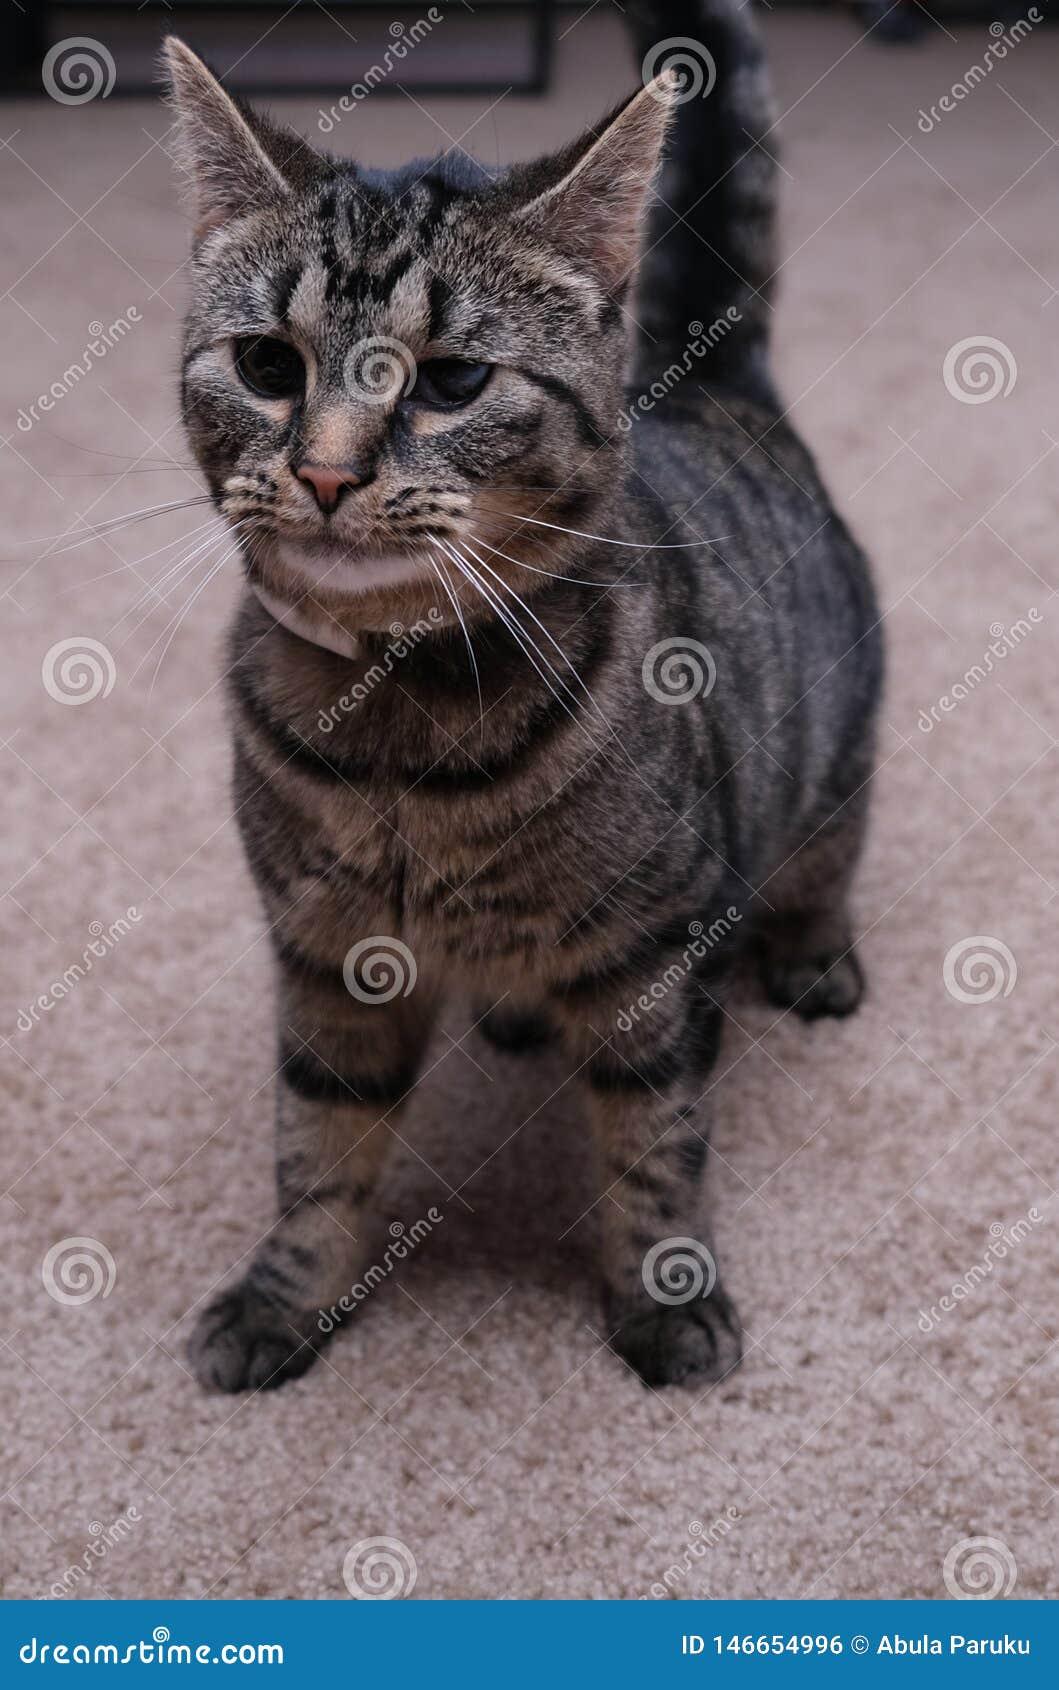 Cat Indoors With Dark Eyes bonito